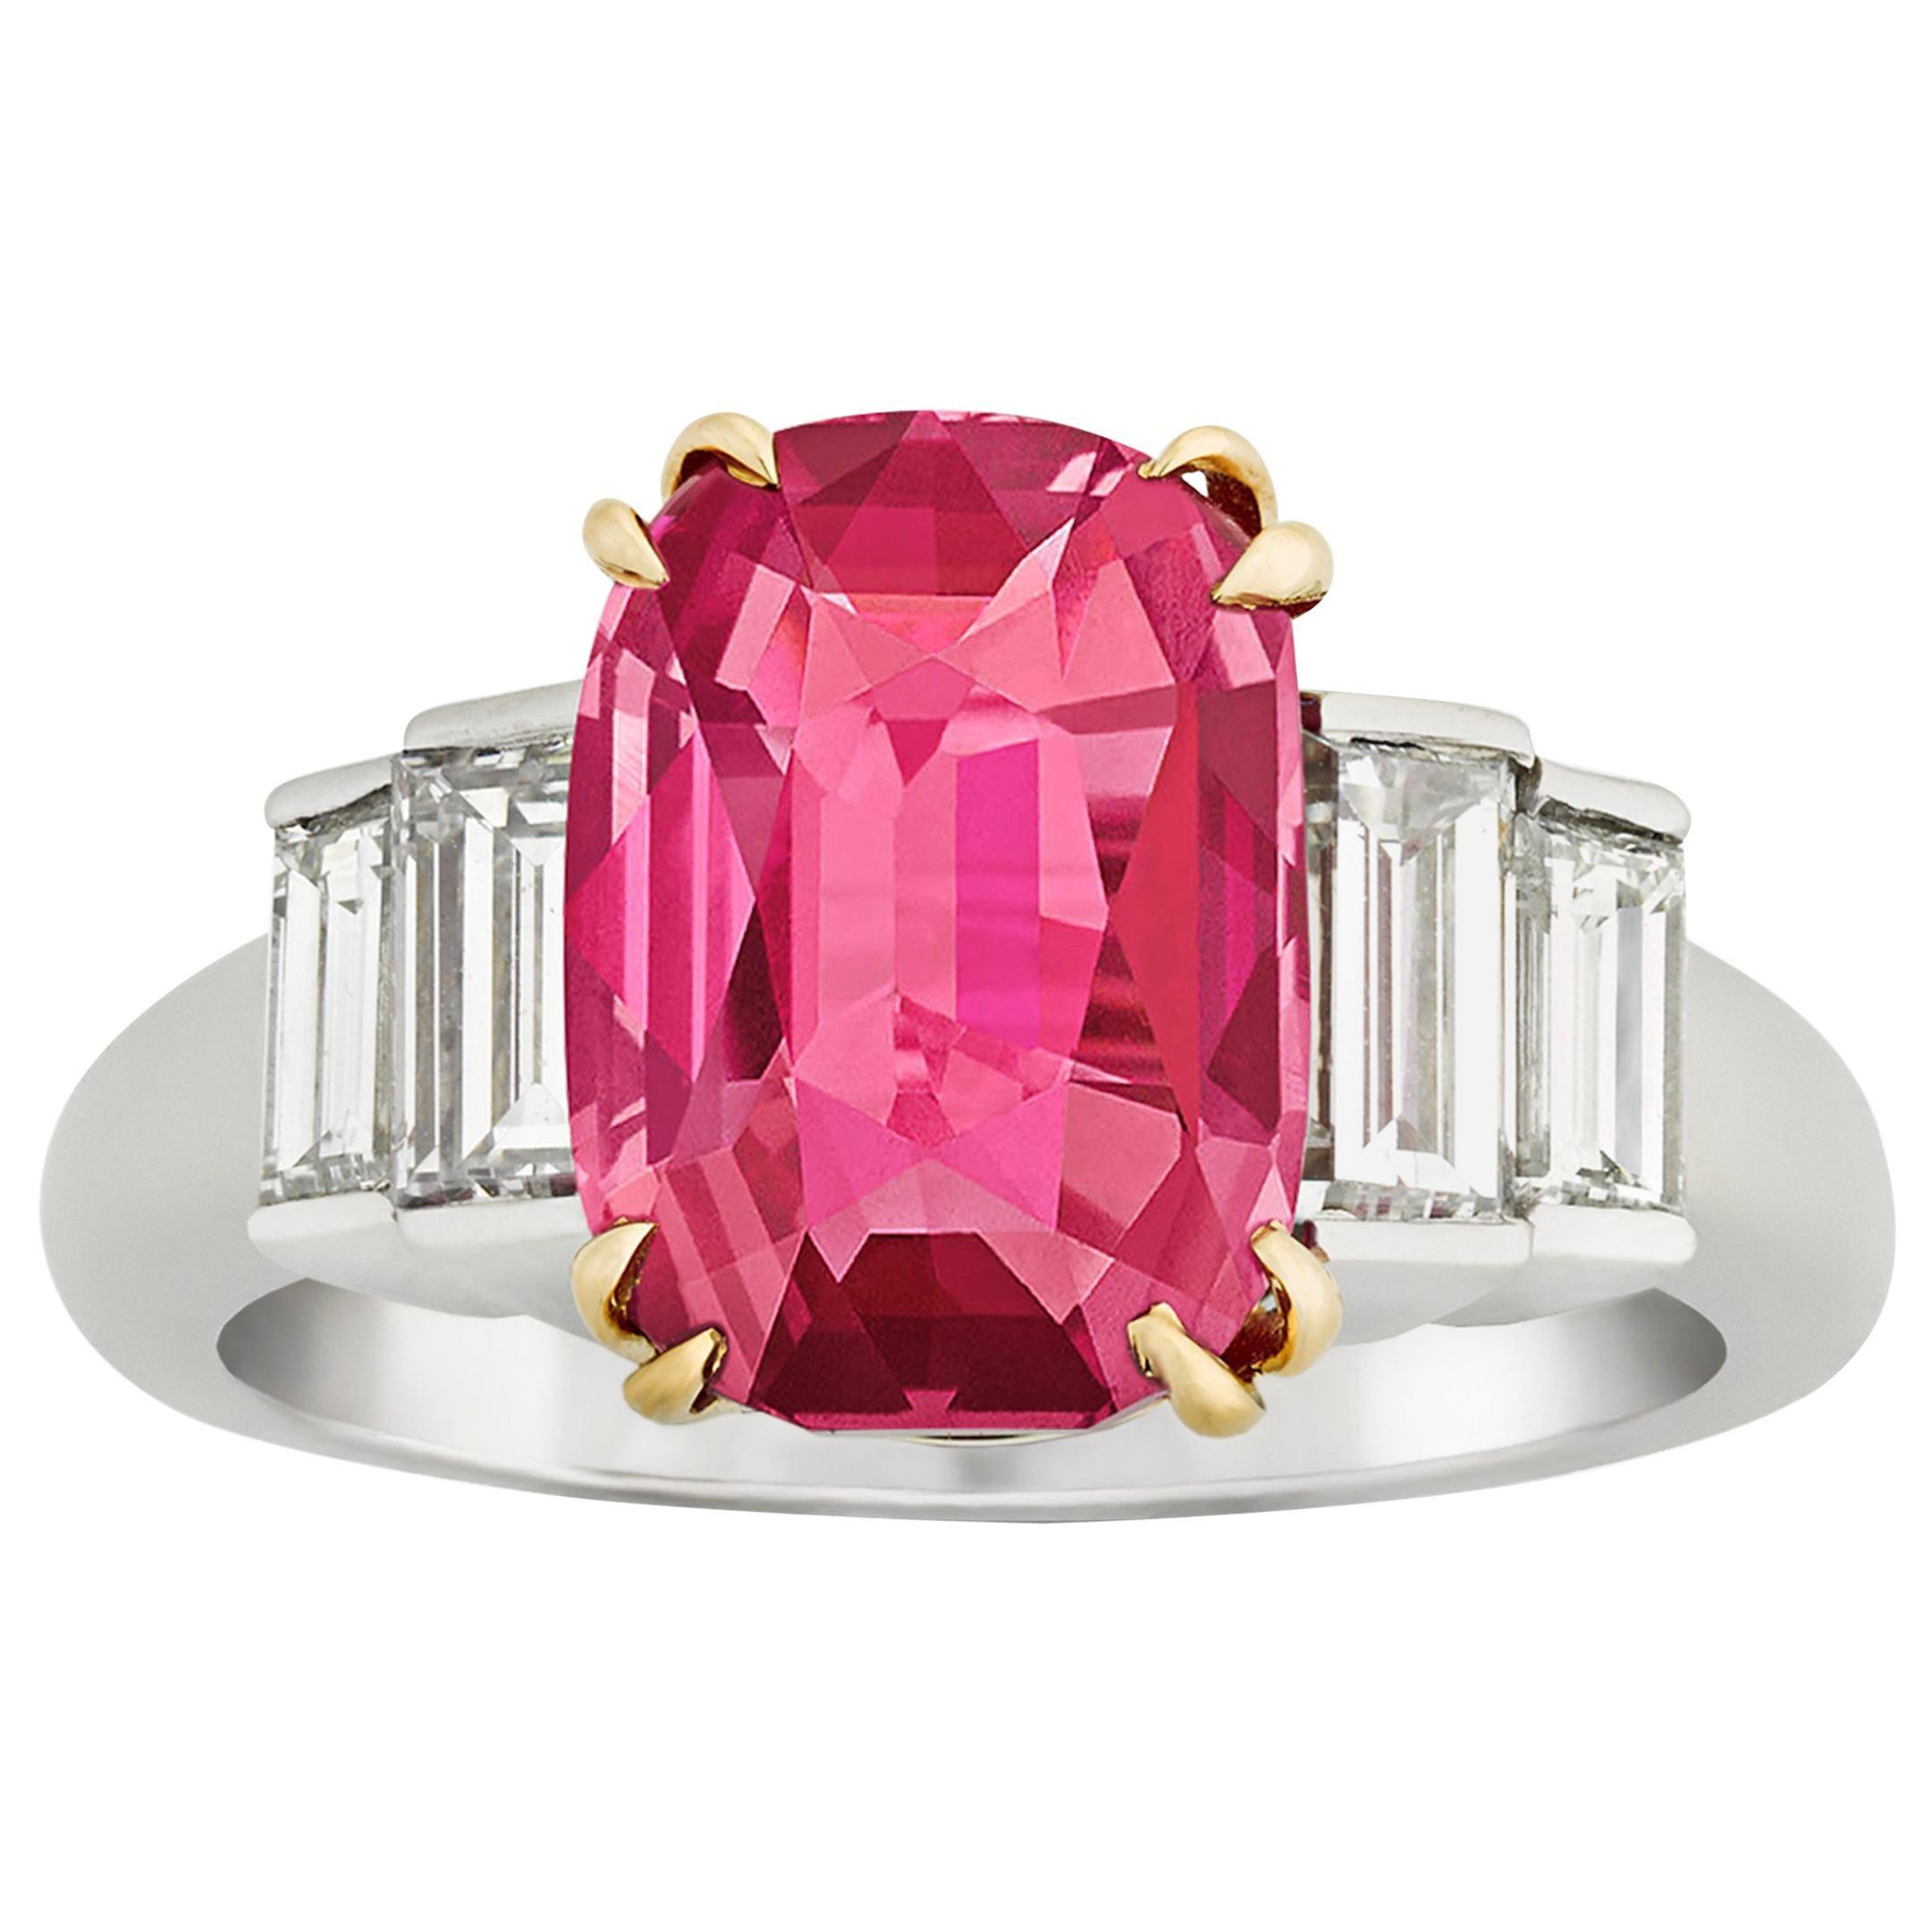 ba643da19 Tiffany and Co. 4.02 Carat Burma Ruby Ring For Sale at 1stdibs